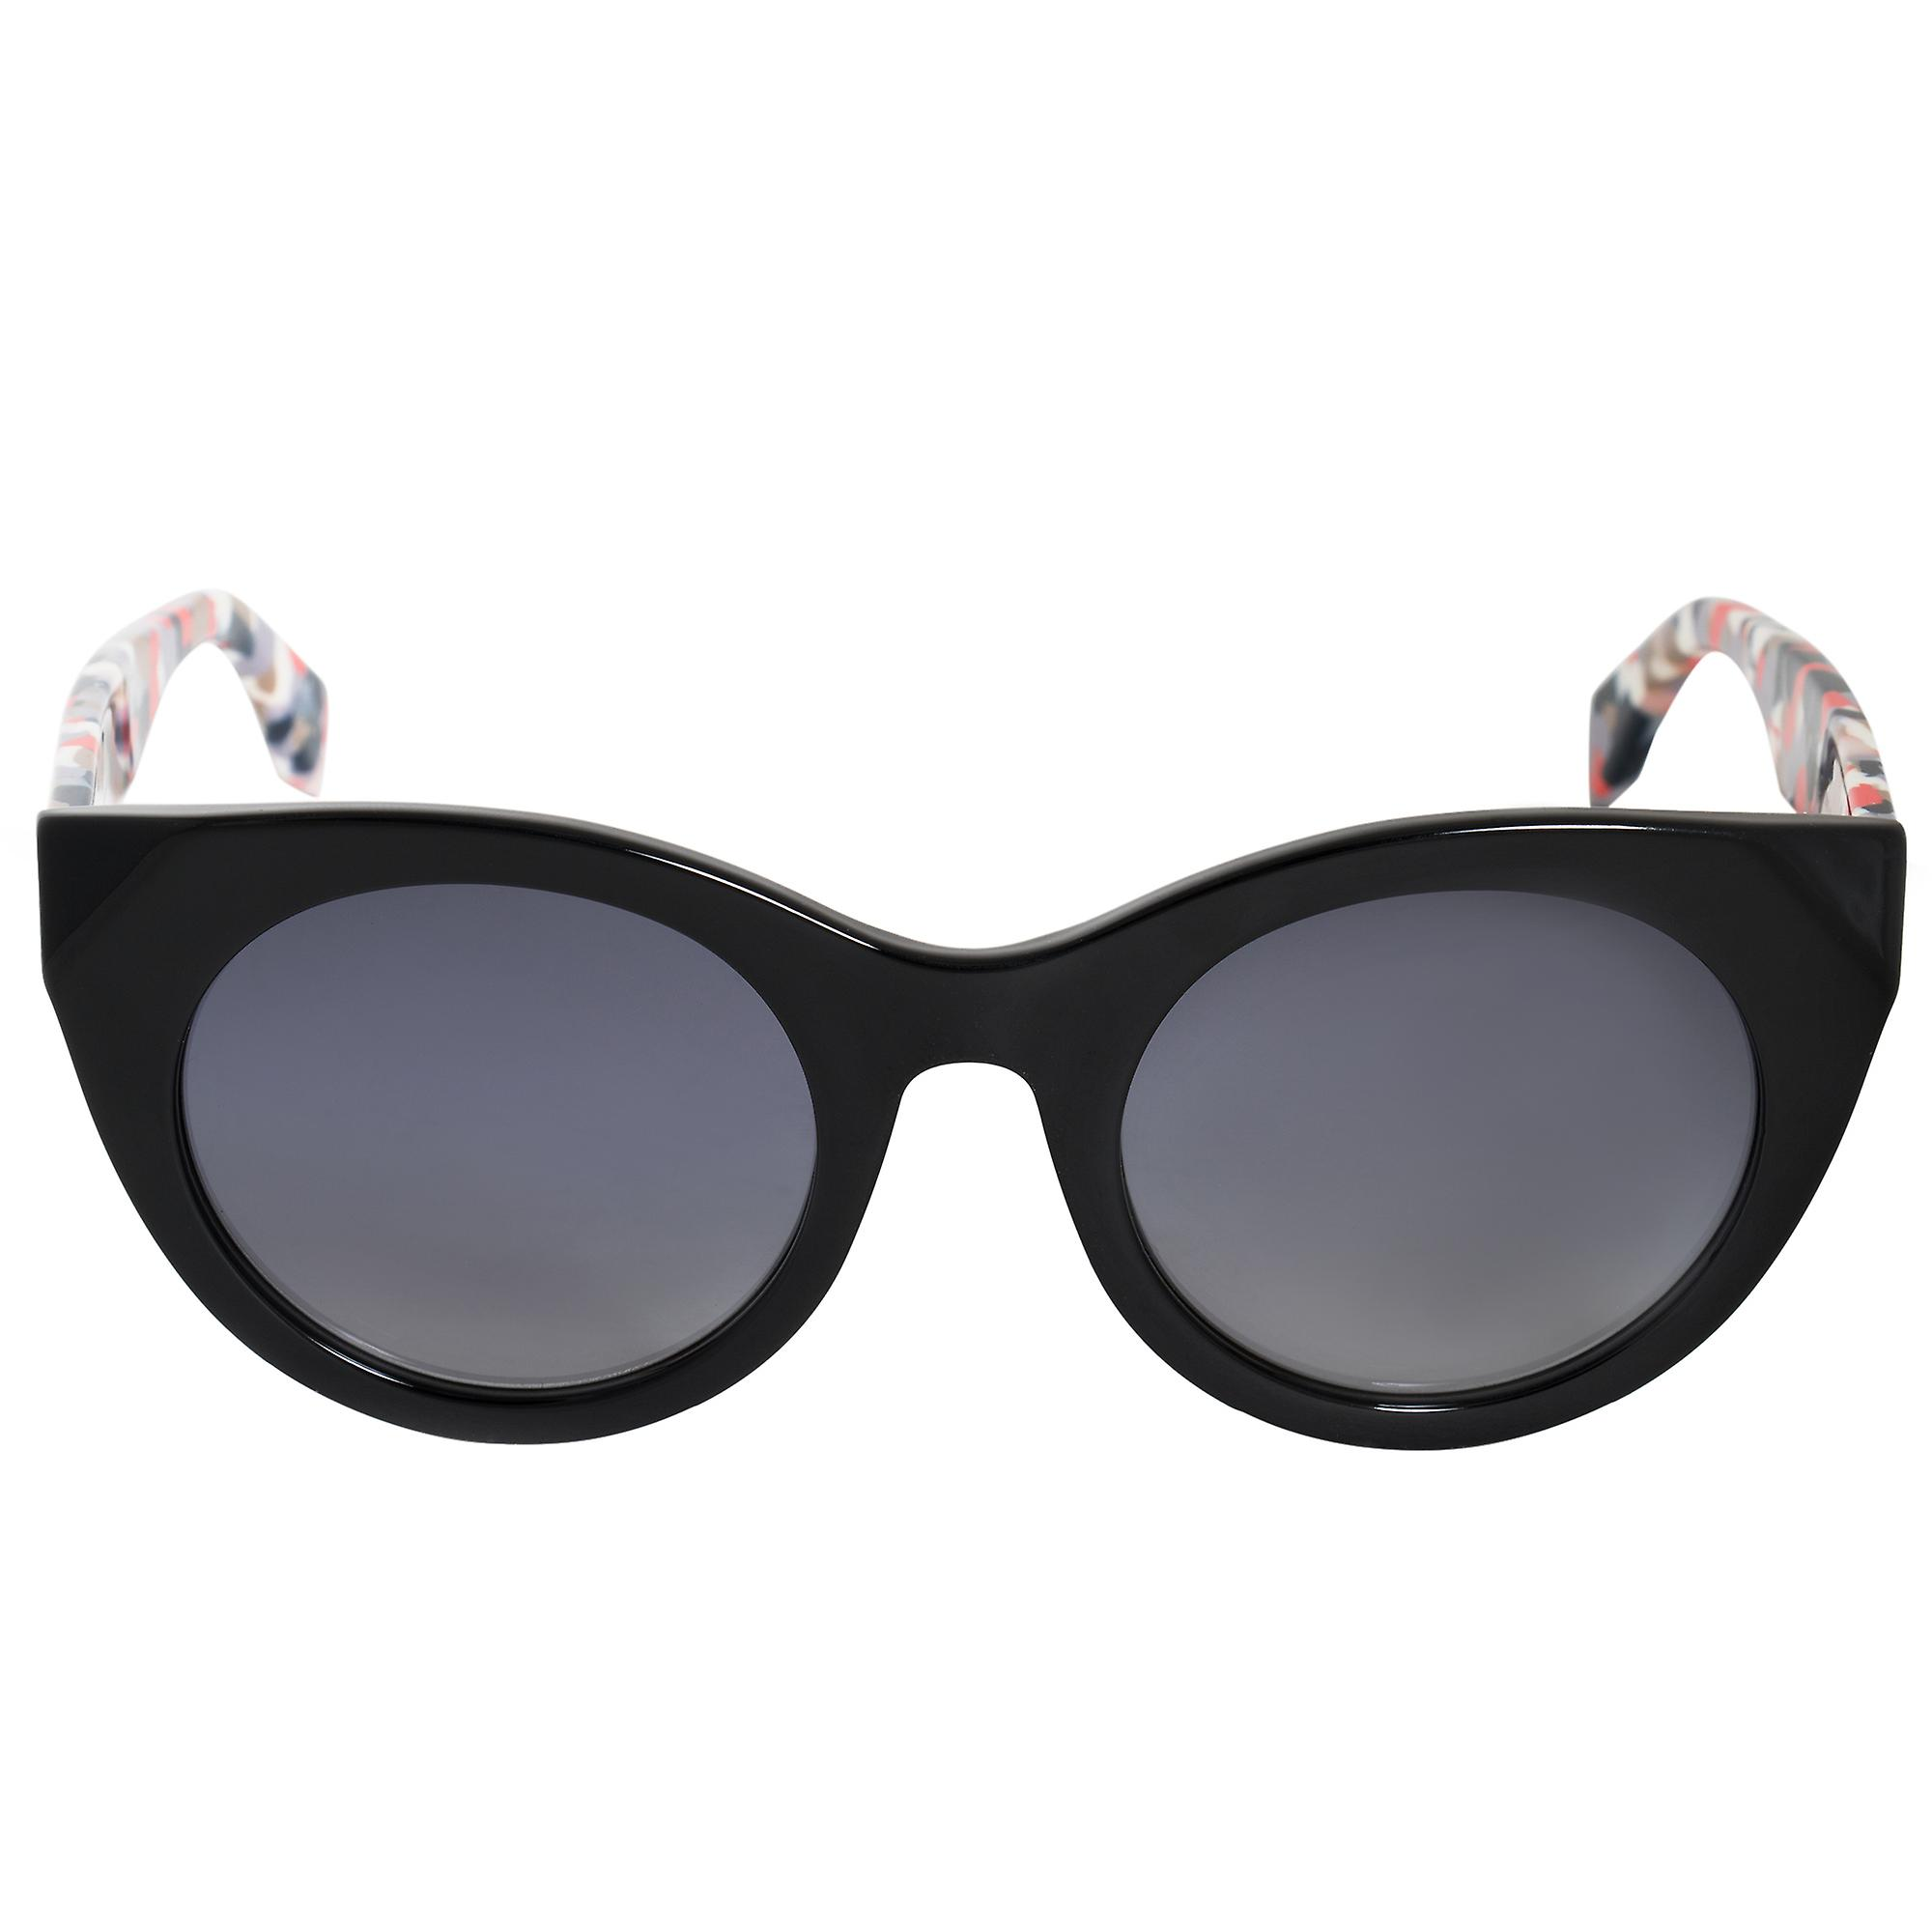 FF0203S de lunettes de soleil Fendi Cat Eye 738 HD 50